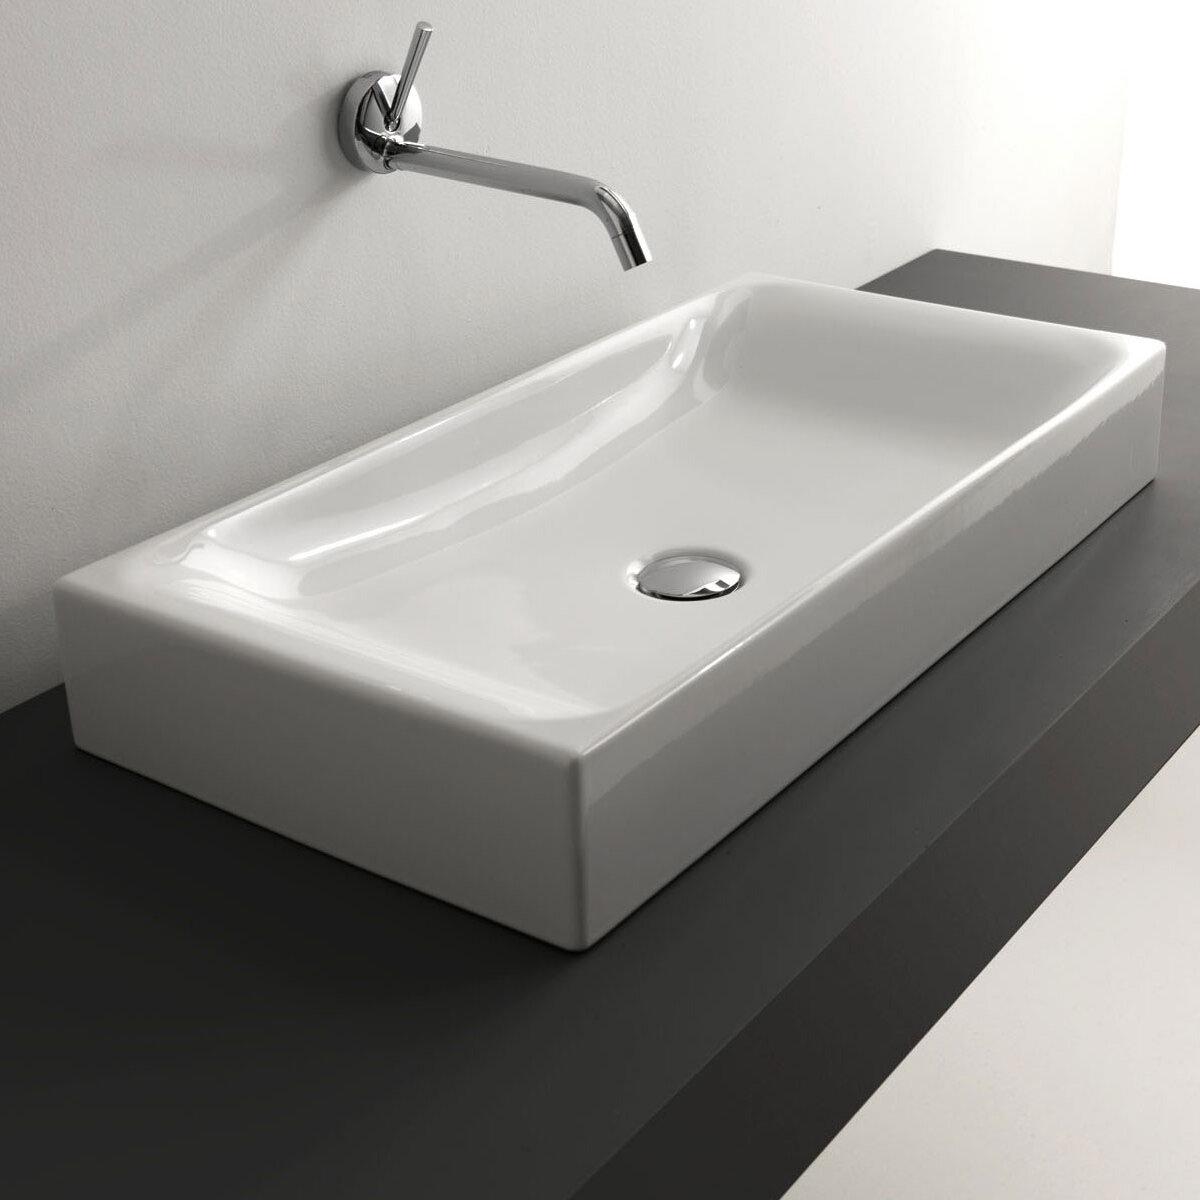 Ws Bath Collections Cento Ceramic Ceramic Rectangular Vessel Bathroom Sink Wayfair